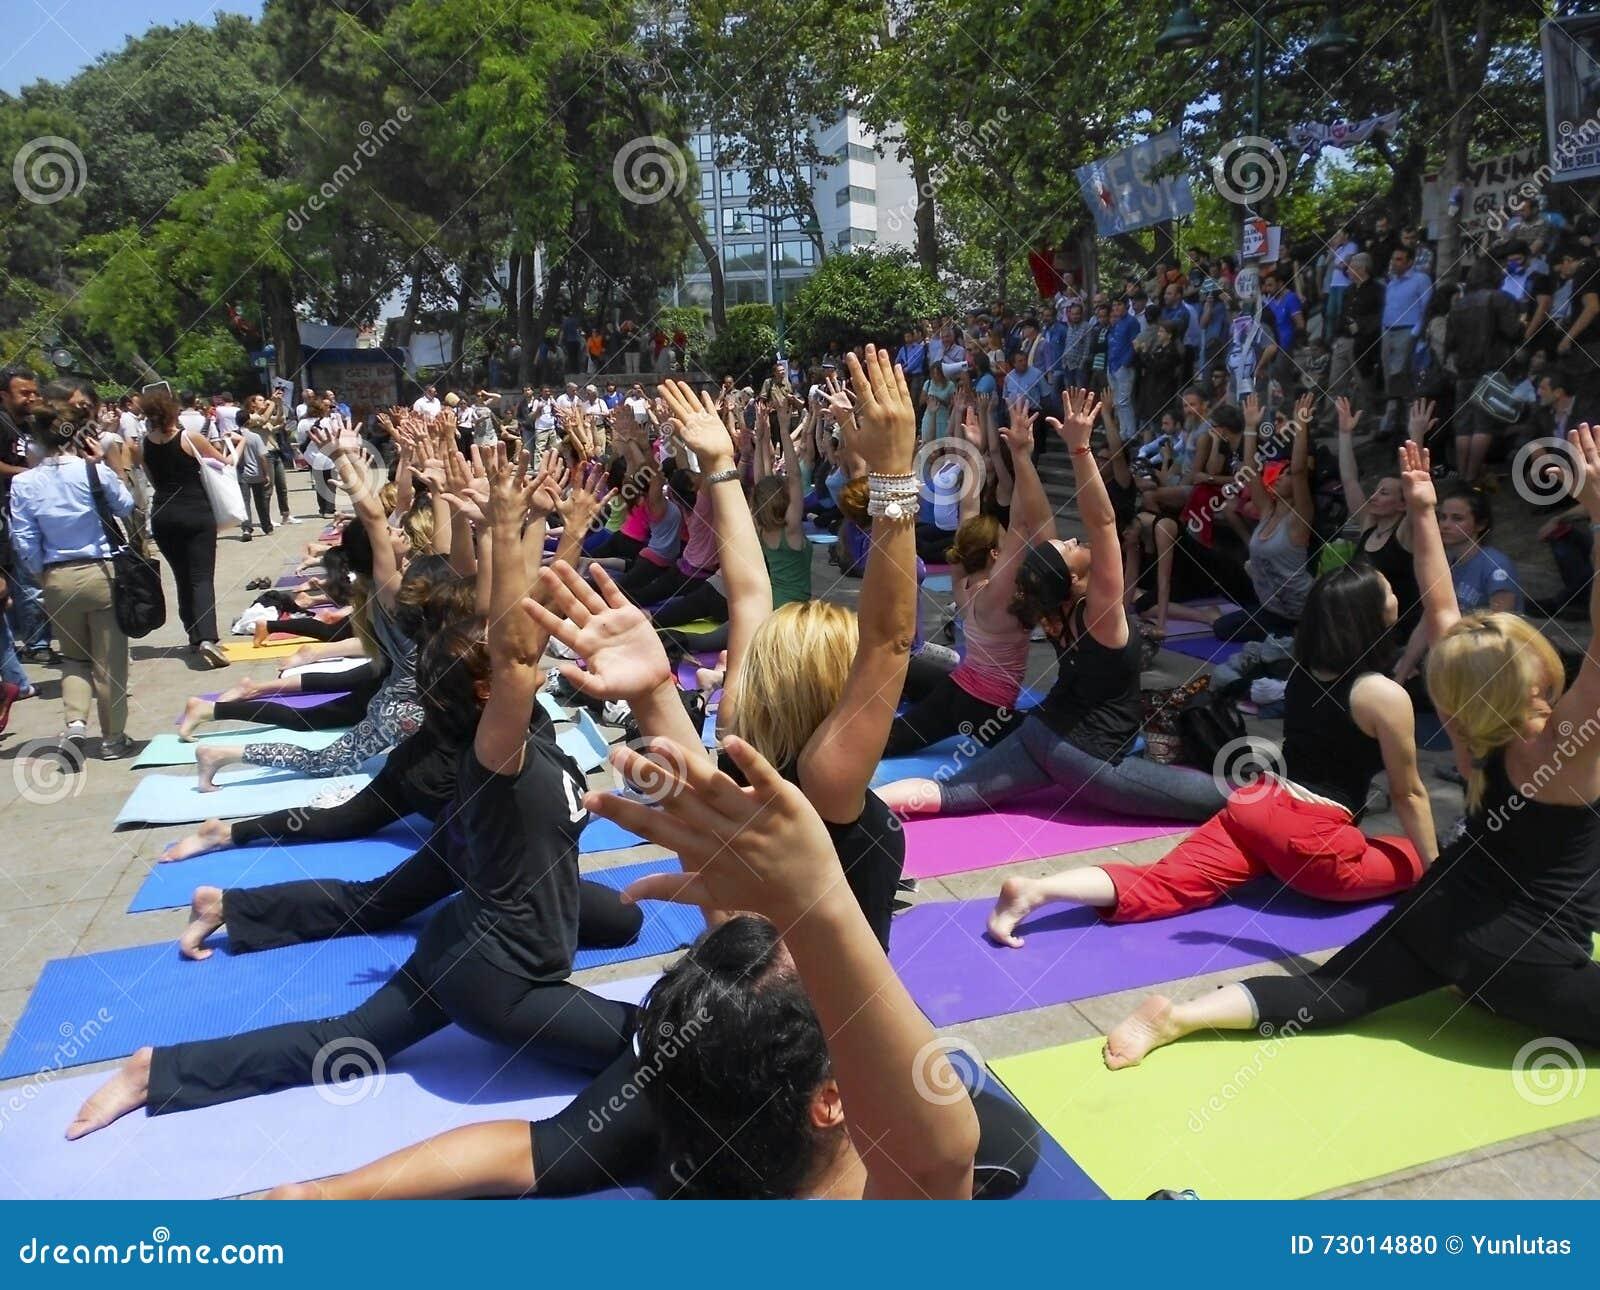 Парк Taksim Gezi в защищать активистов, пока спорт